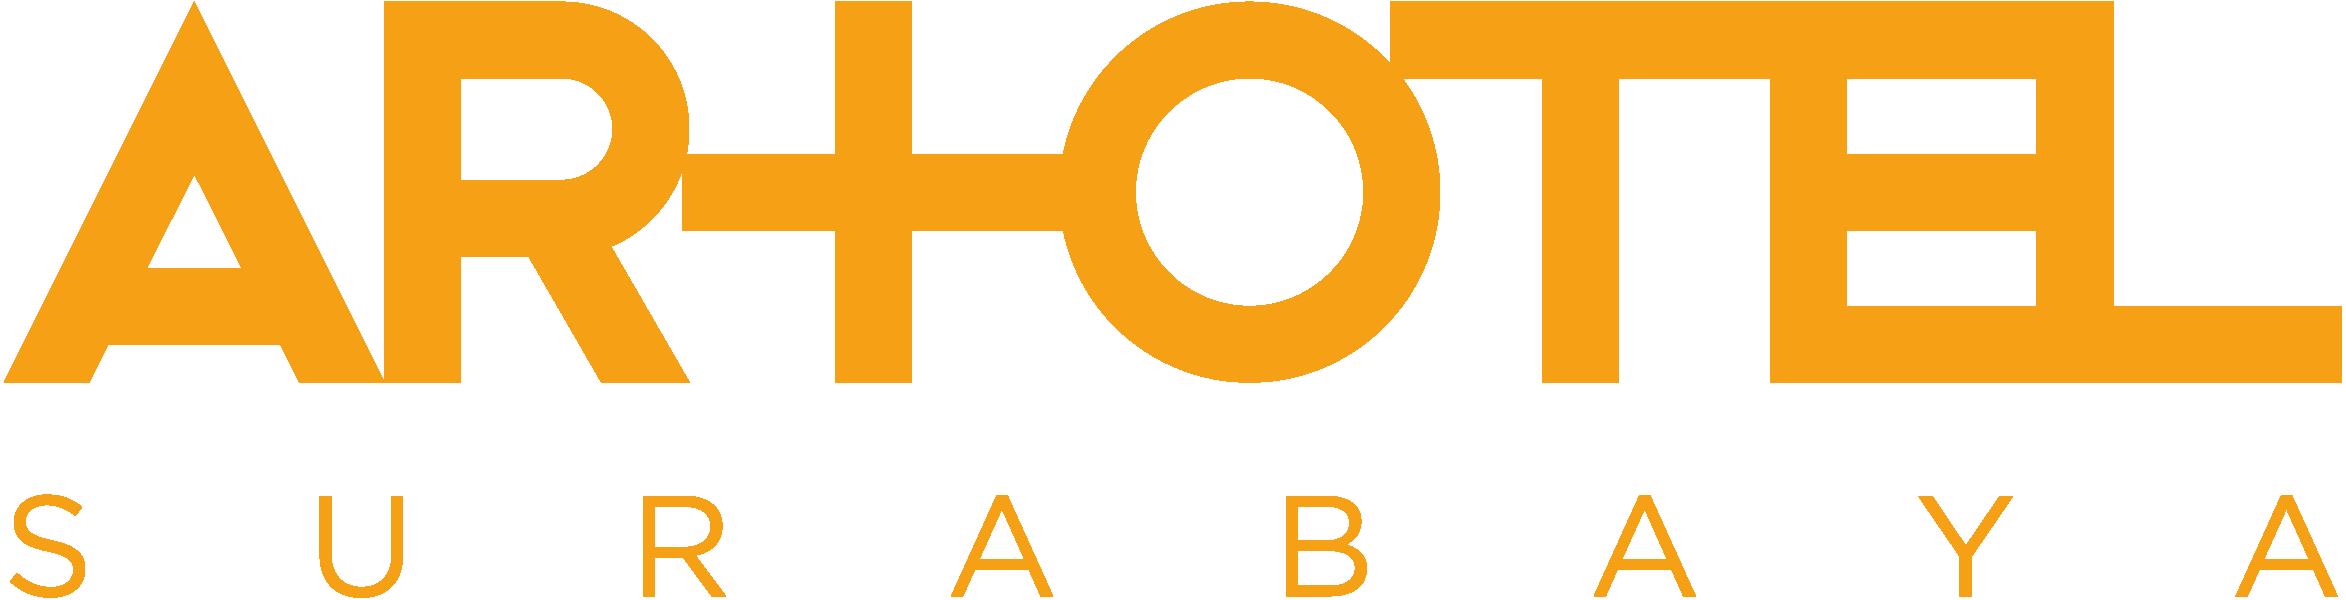 logo-artotel-surabaya